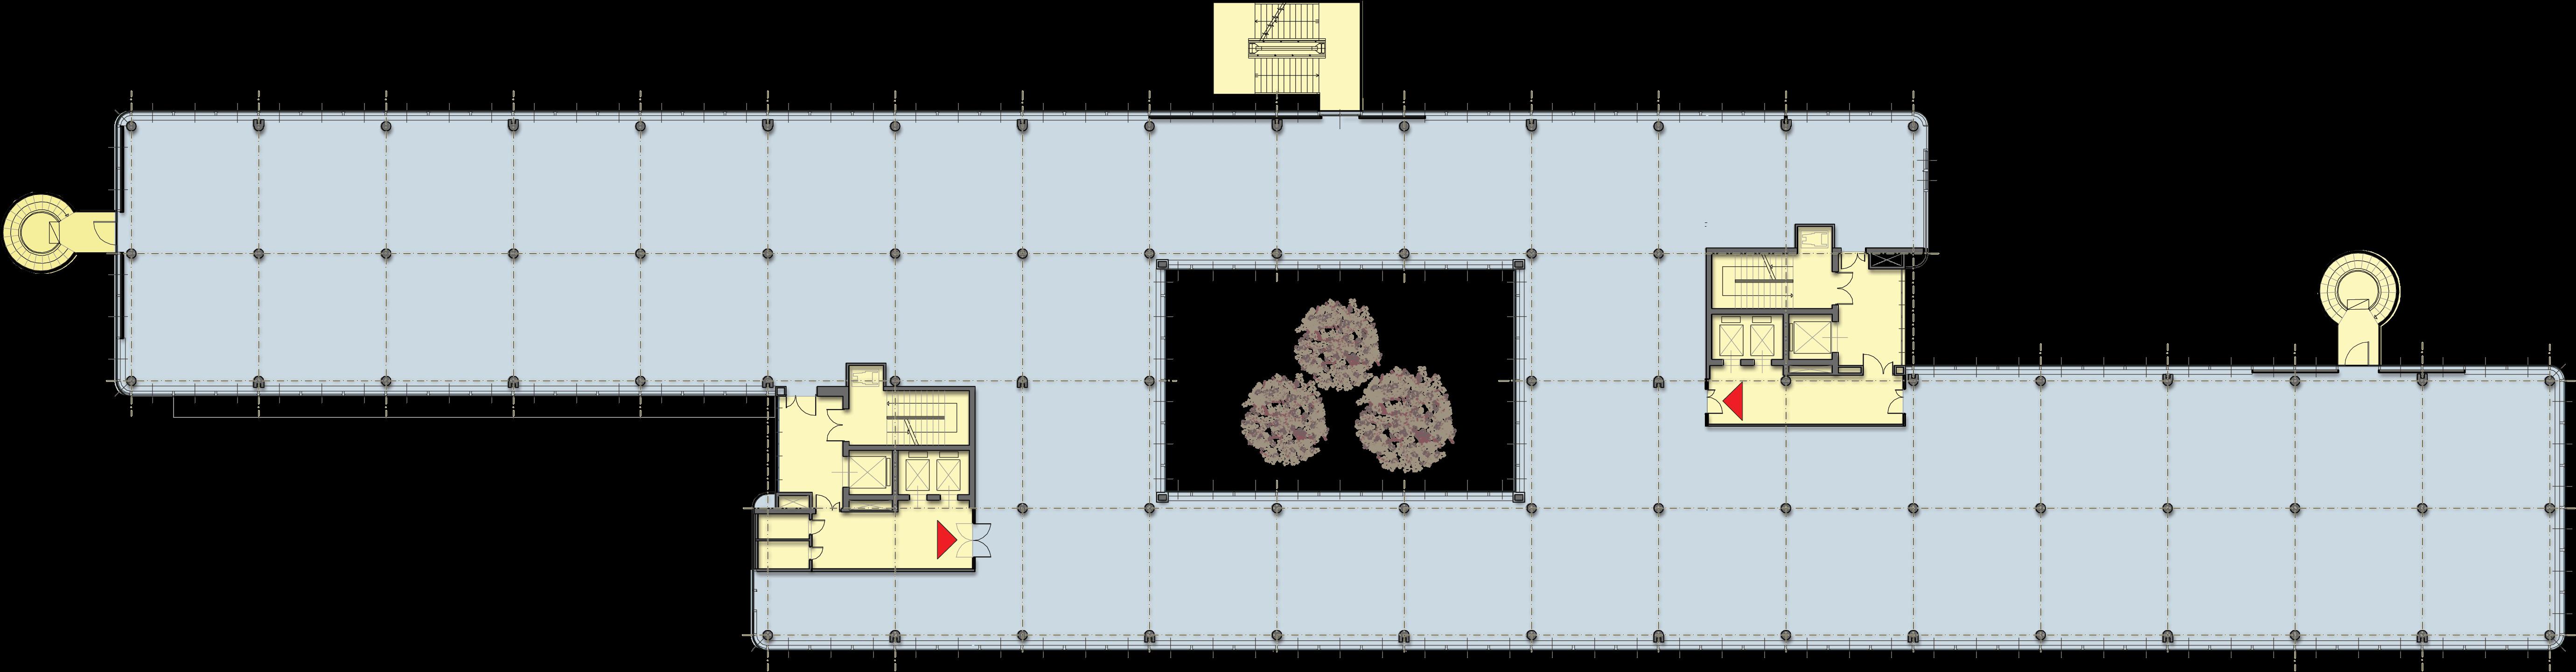 Planimetria piano tipo